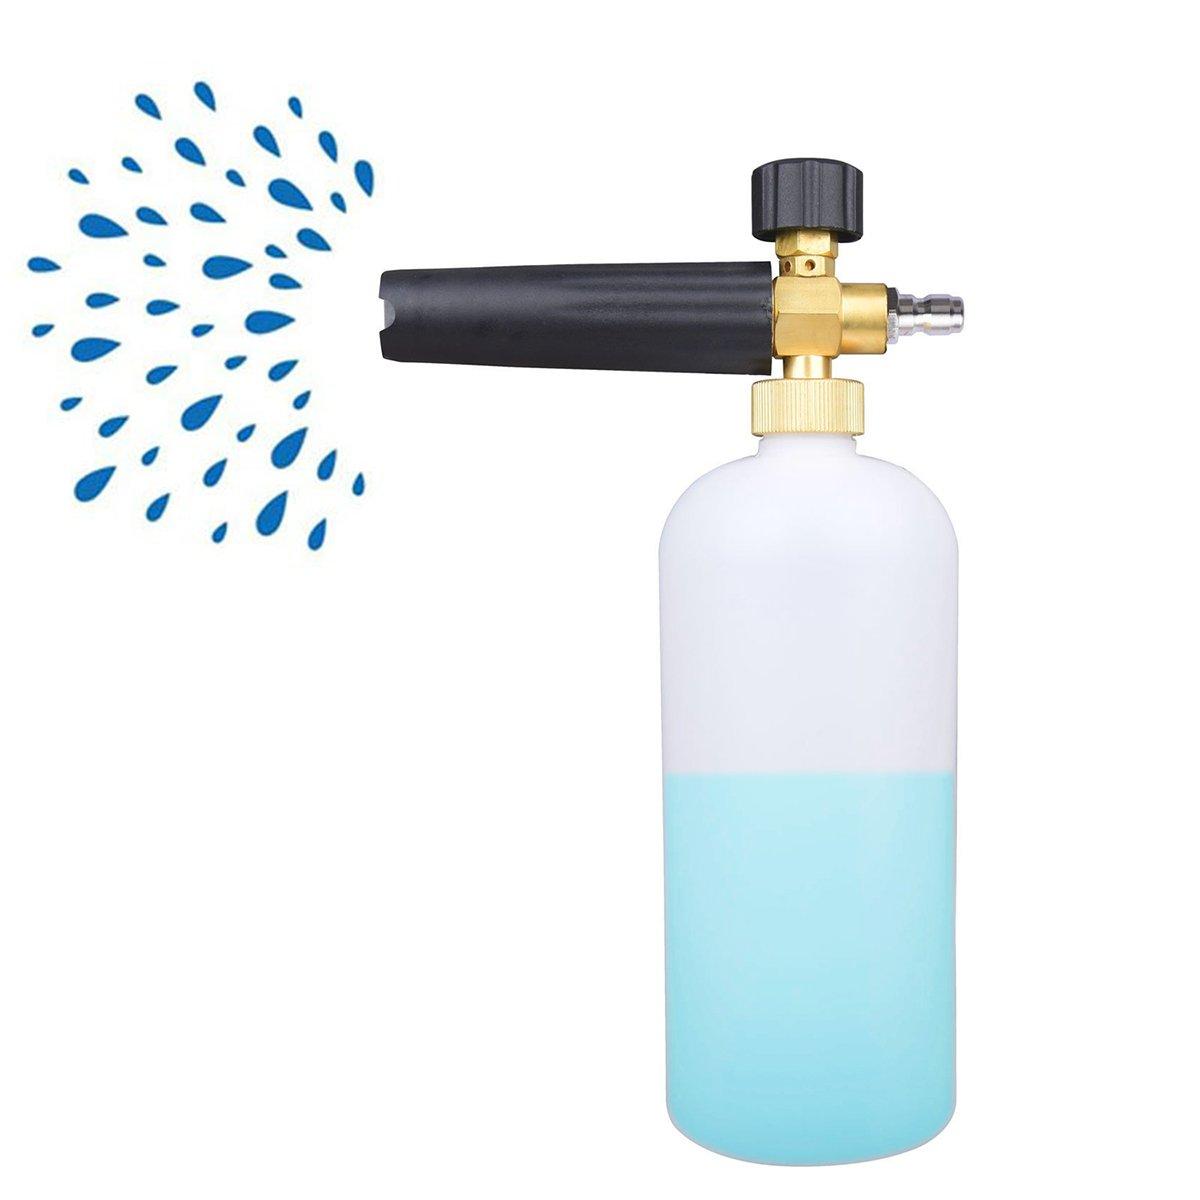 Immuson Pressure Washer Jet Wash 1/4'' Quick Release Adjustable Snow Foam Lance Foam Cannon for Pressure Washer Gun